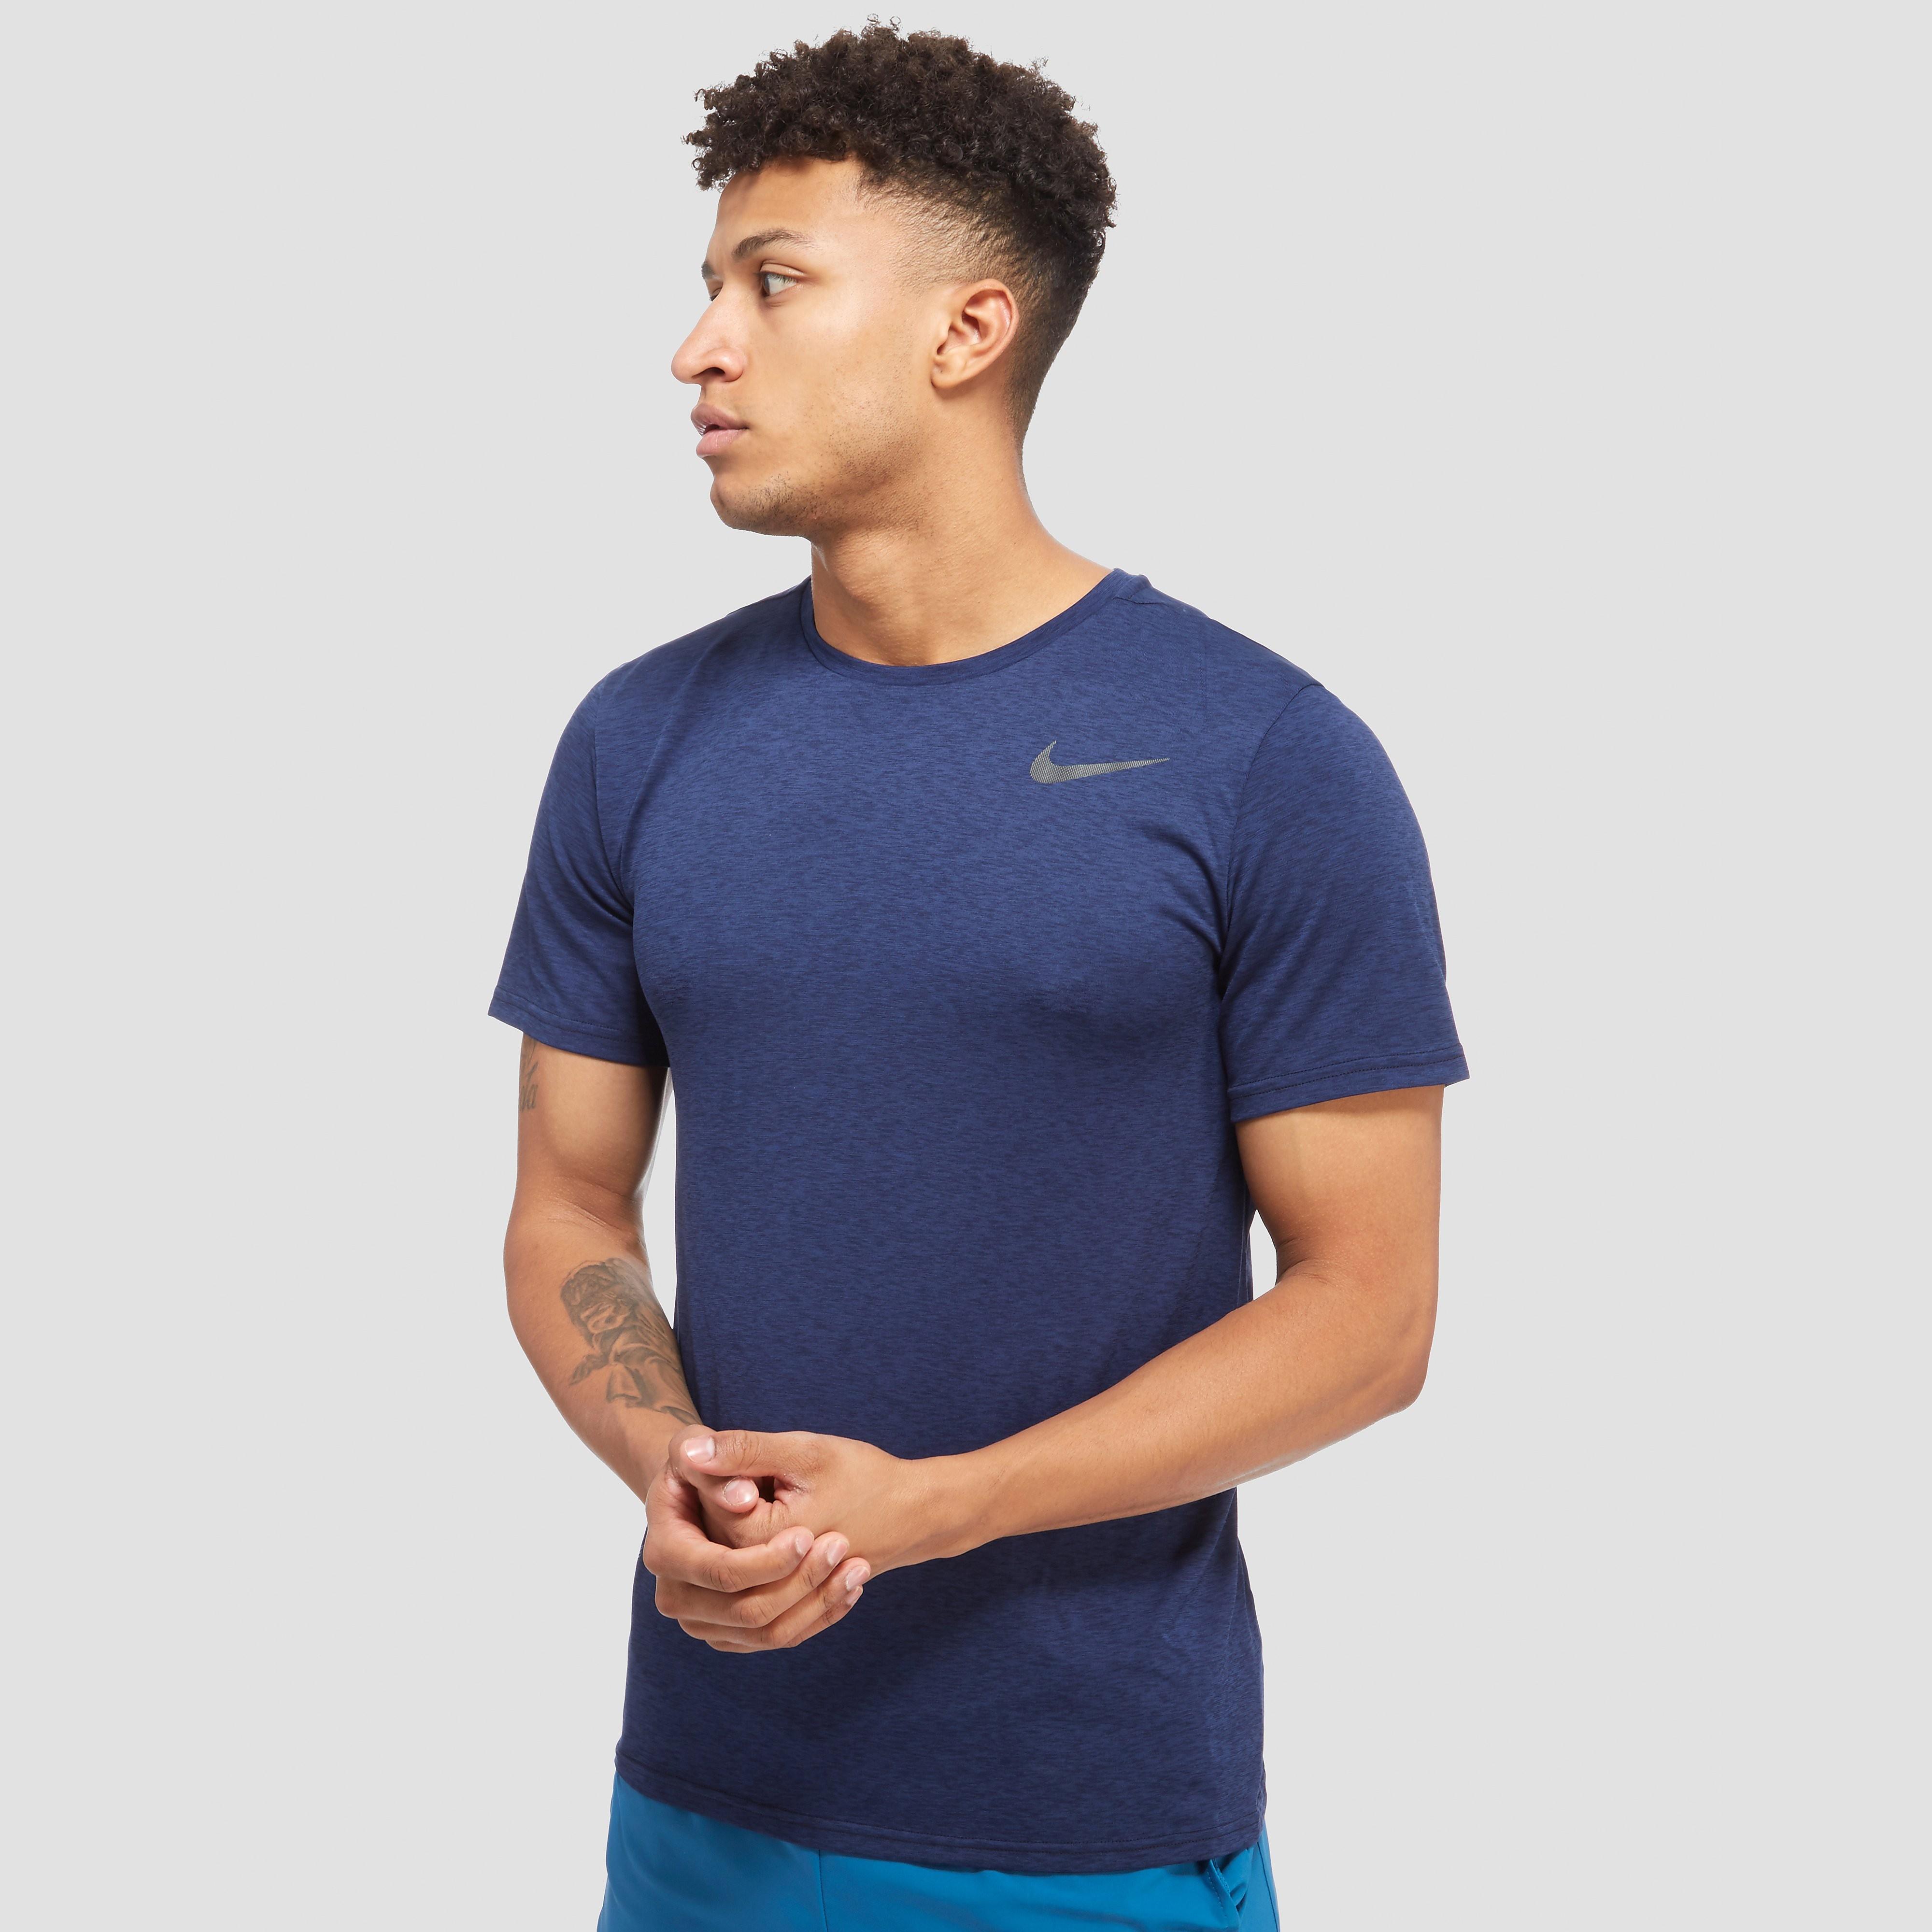 Nike Breathe T-Shirt